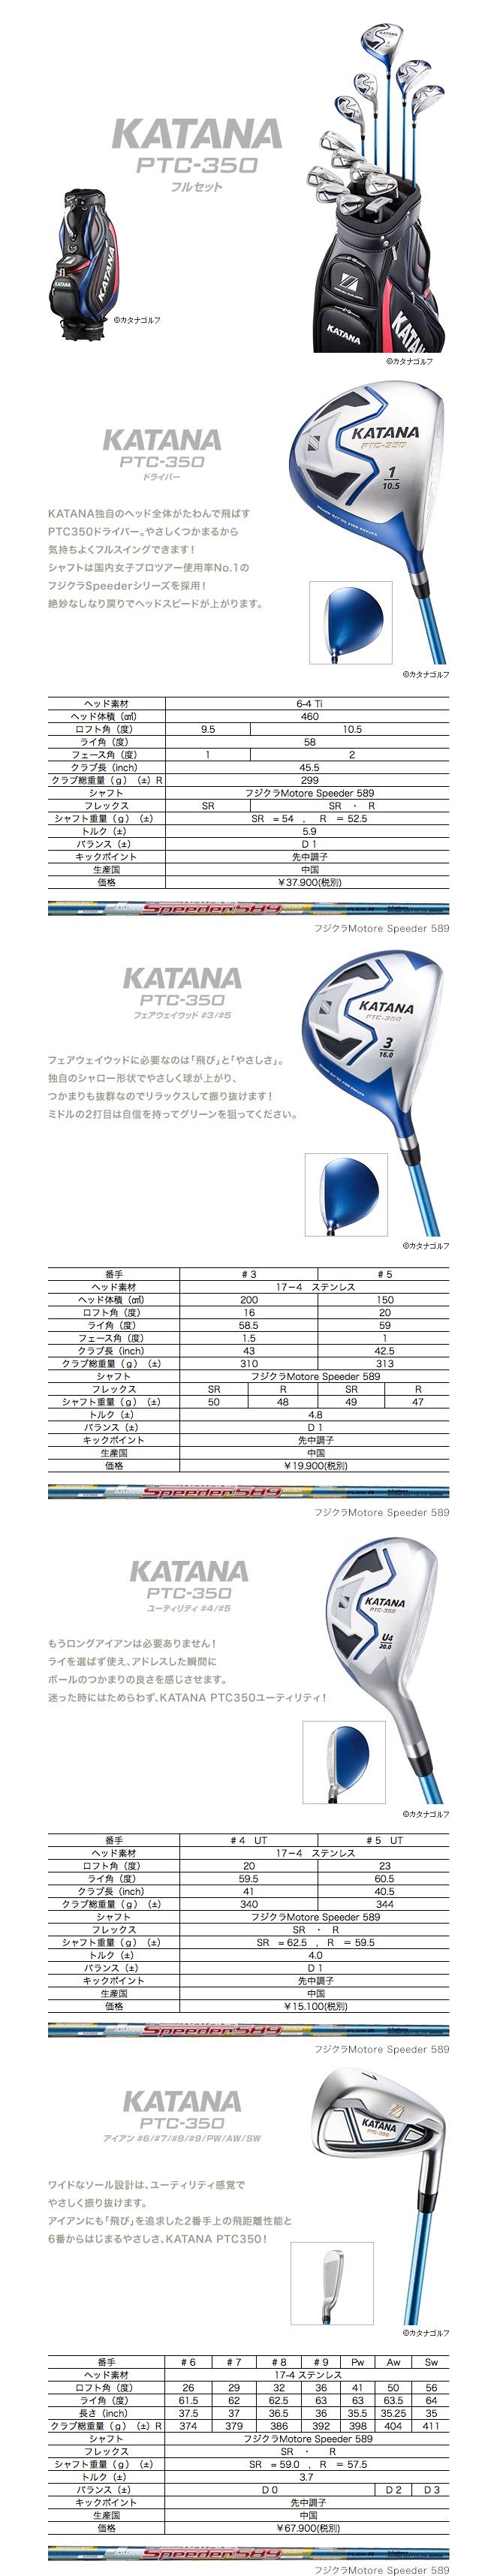 Katana PTC-350 Full Set